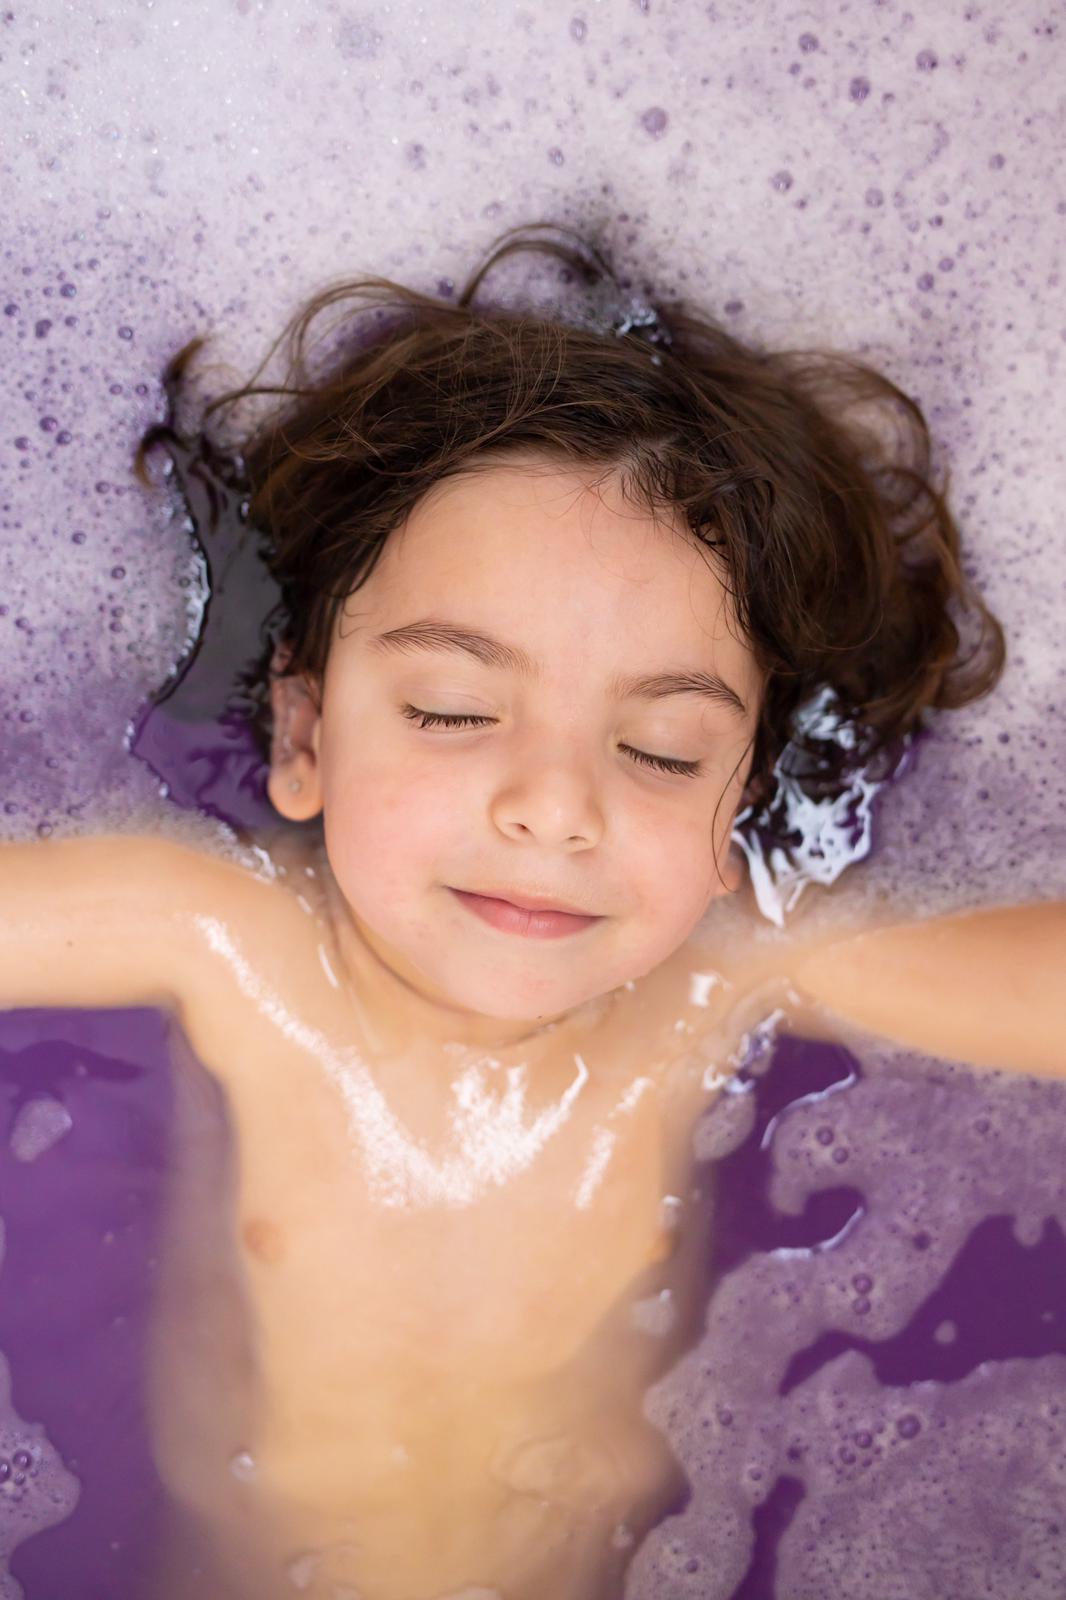 Fent dutxes relaxants.